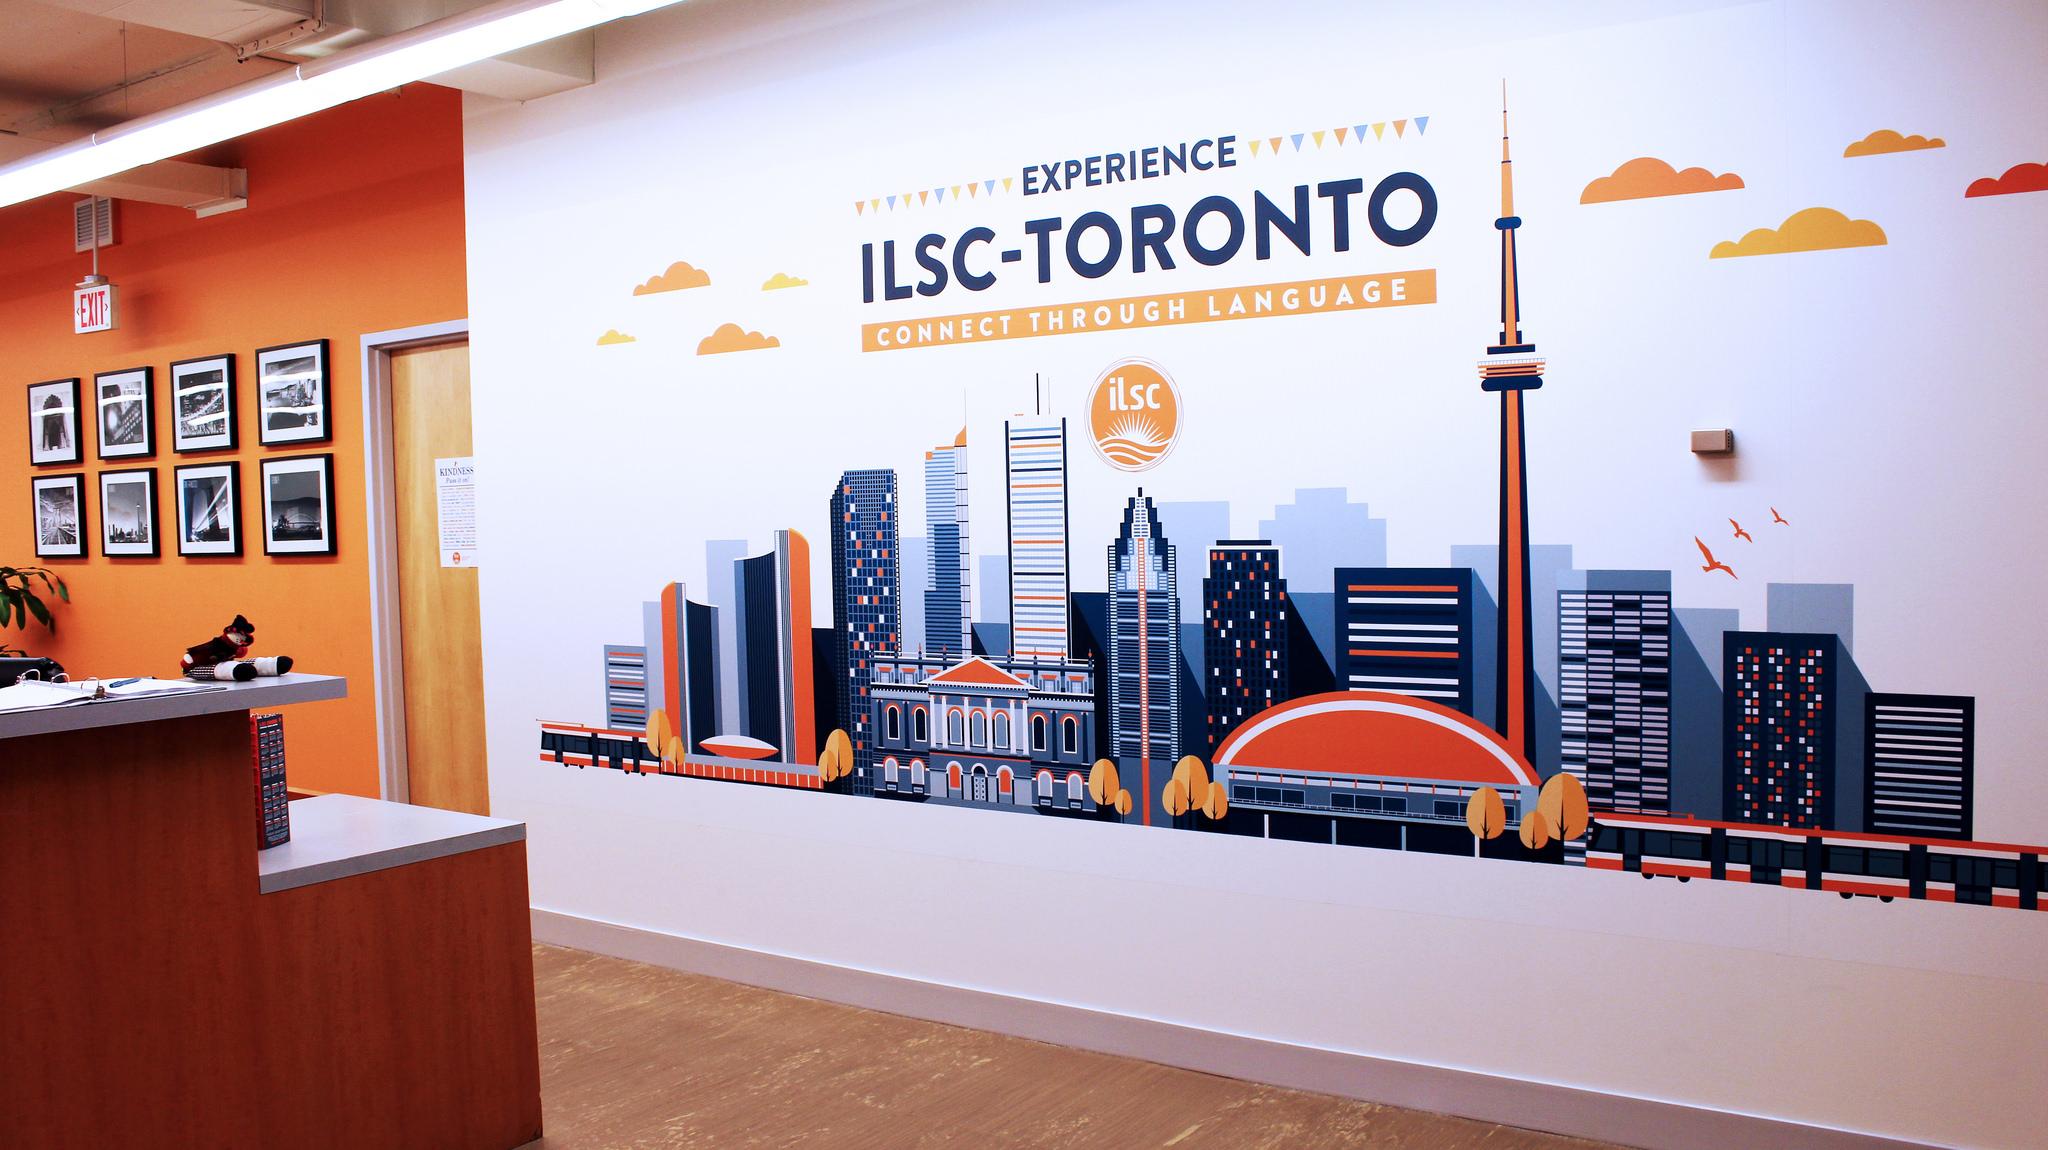 ILSC トロント 語学学校